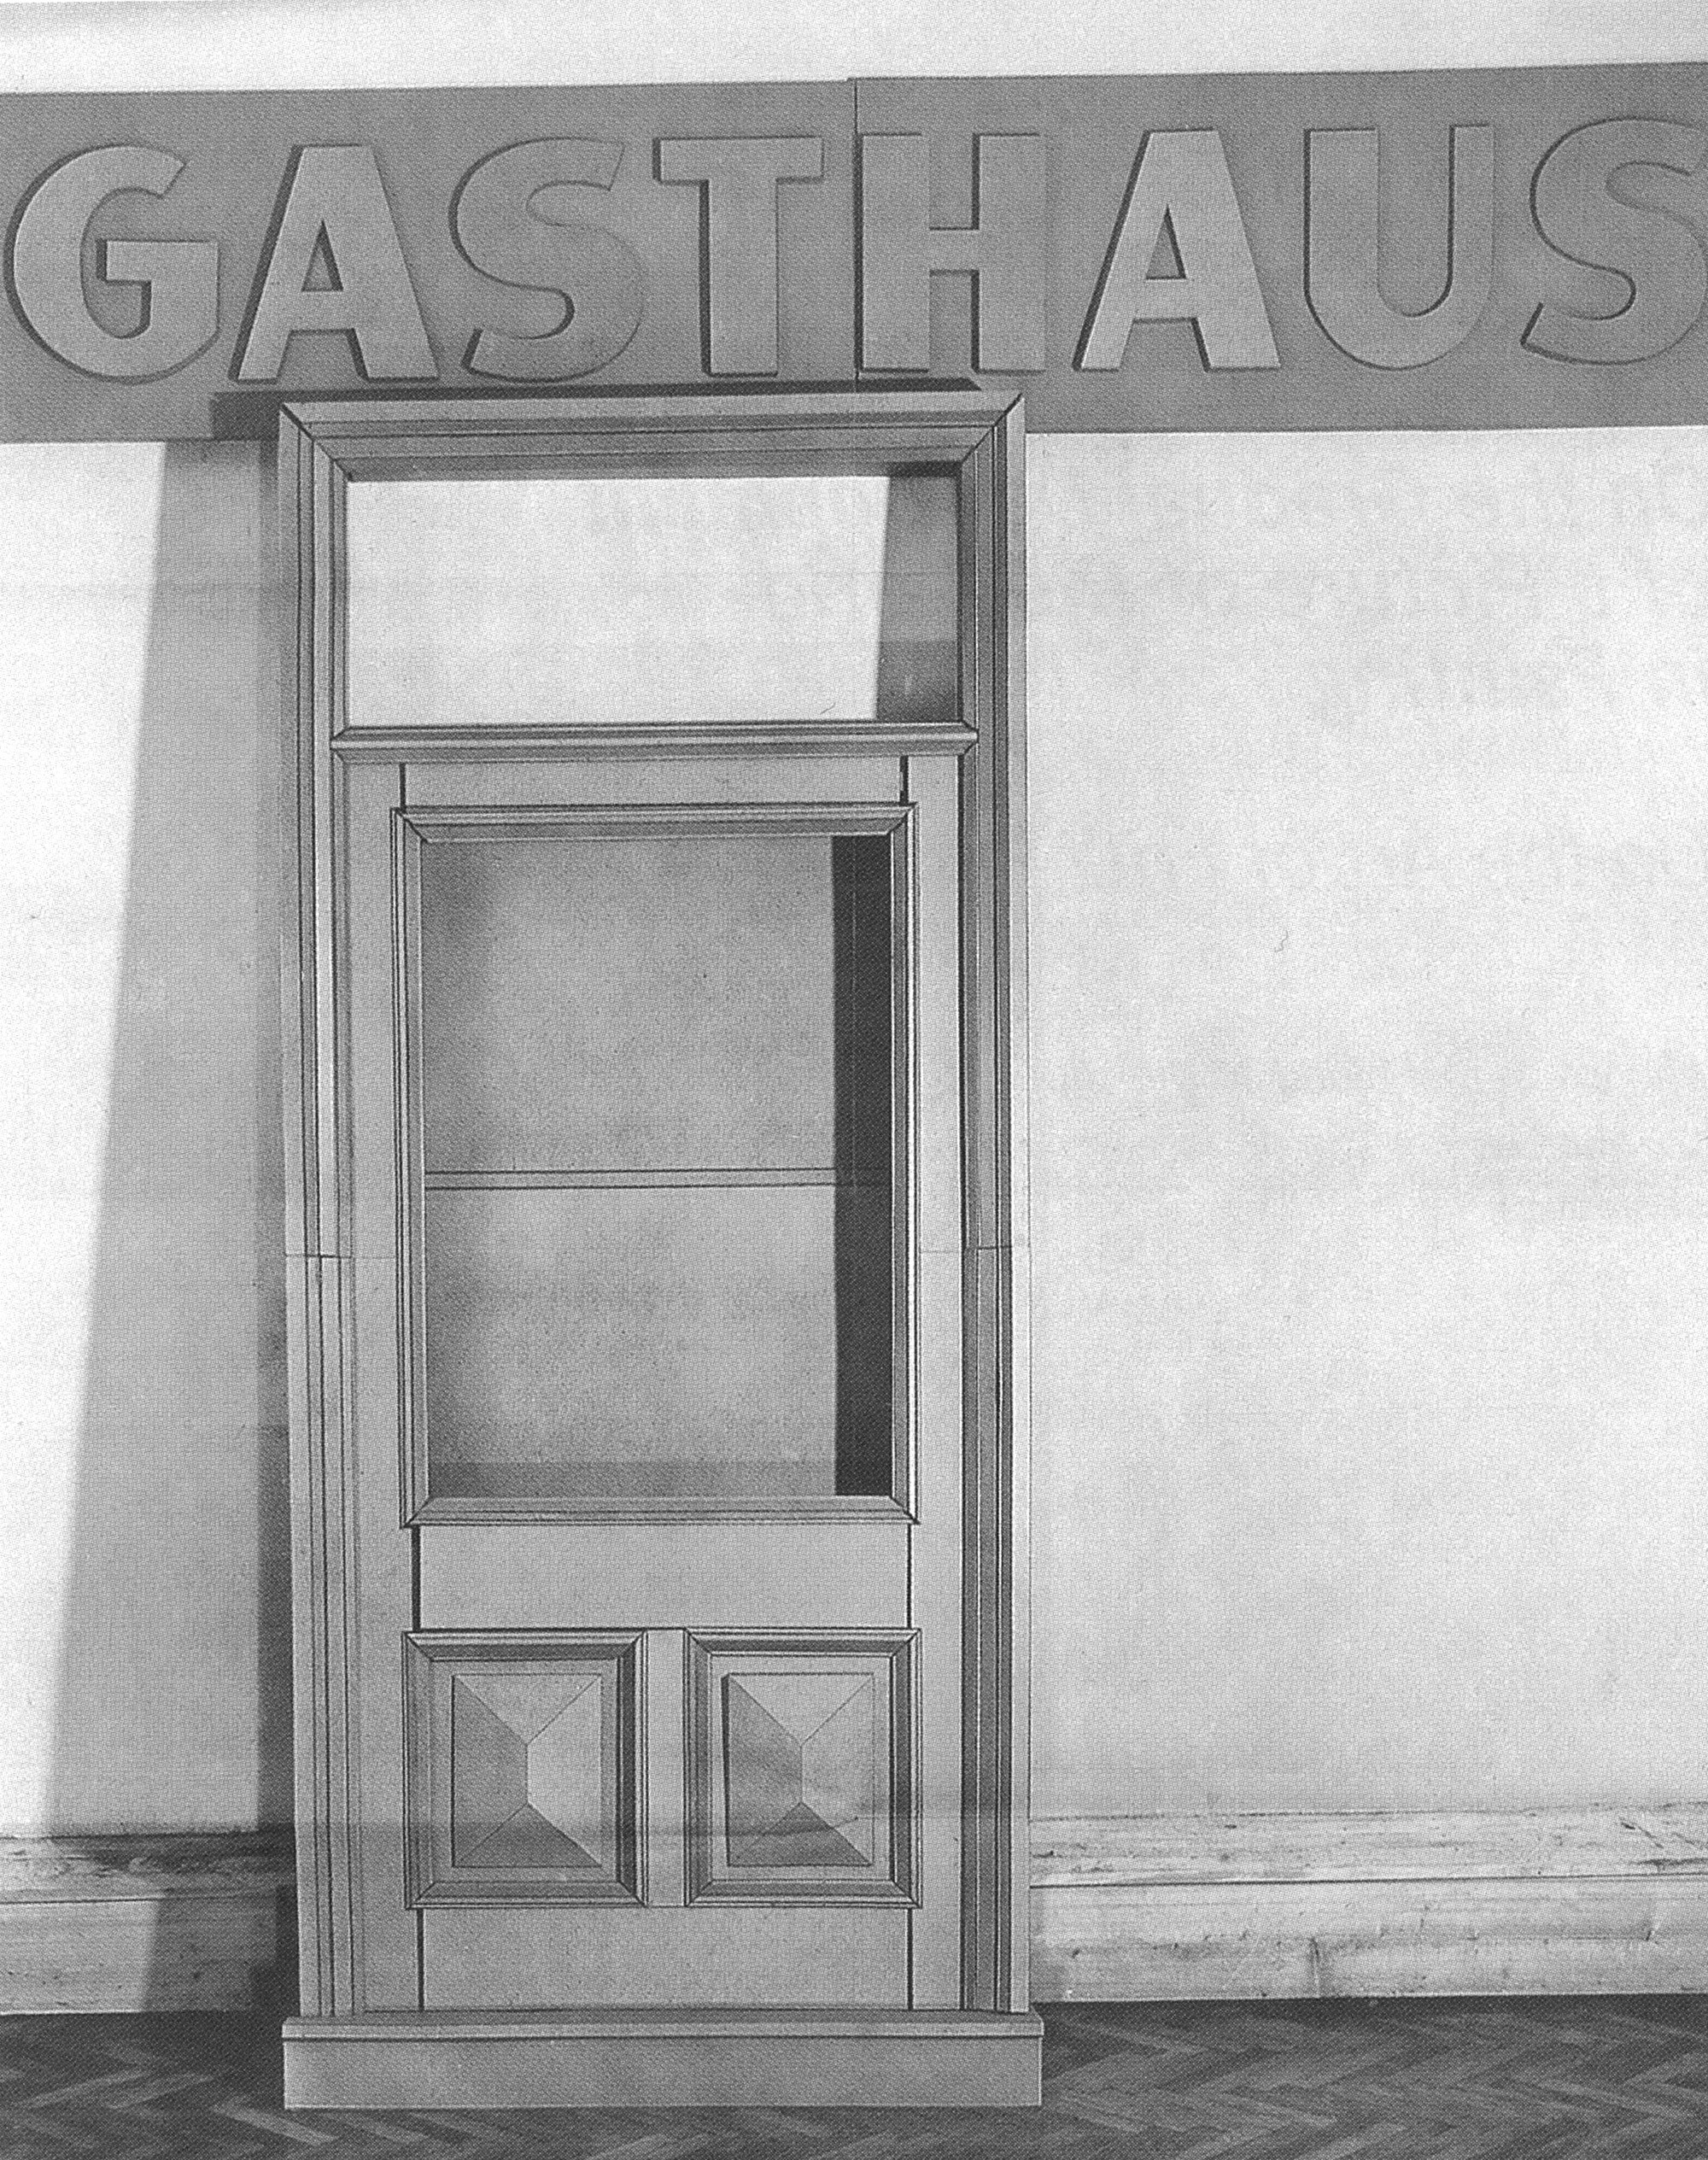 Gasthaus, Fritz Panzer, Kartonskulptur, 1972, Foto: Cora Pongracz